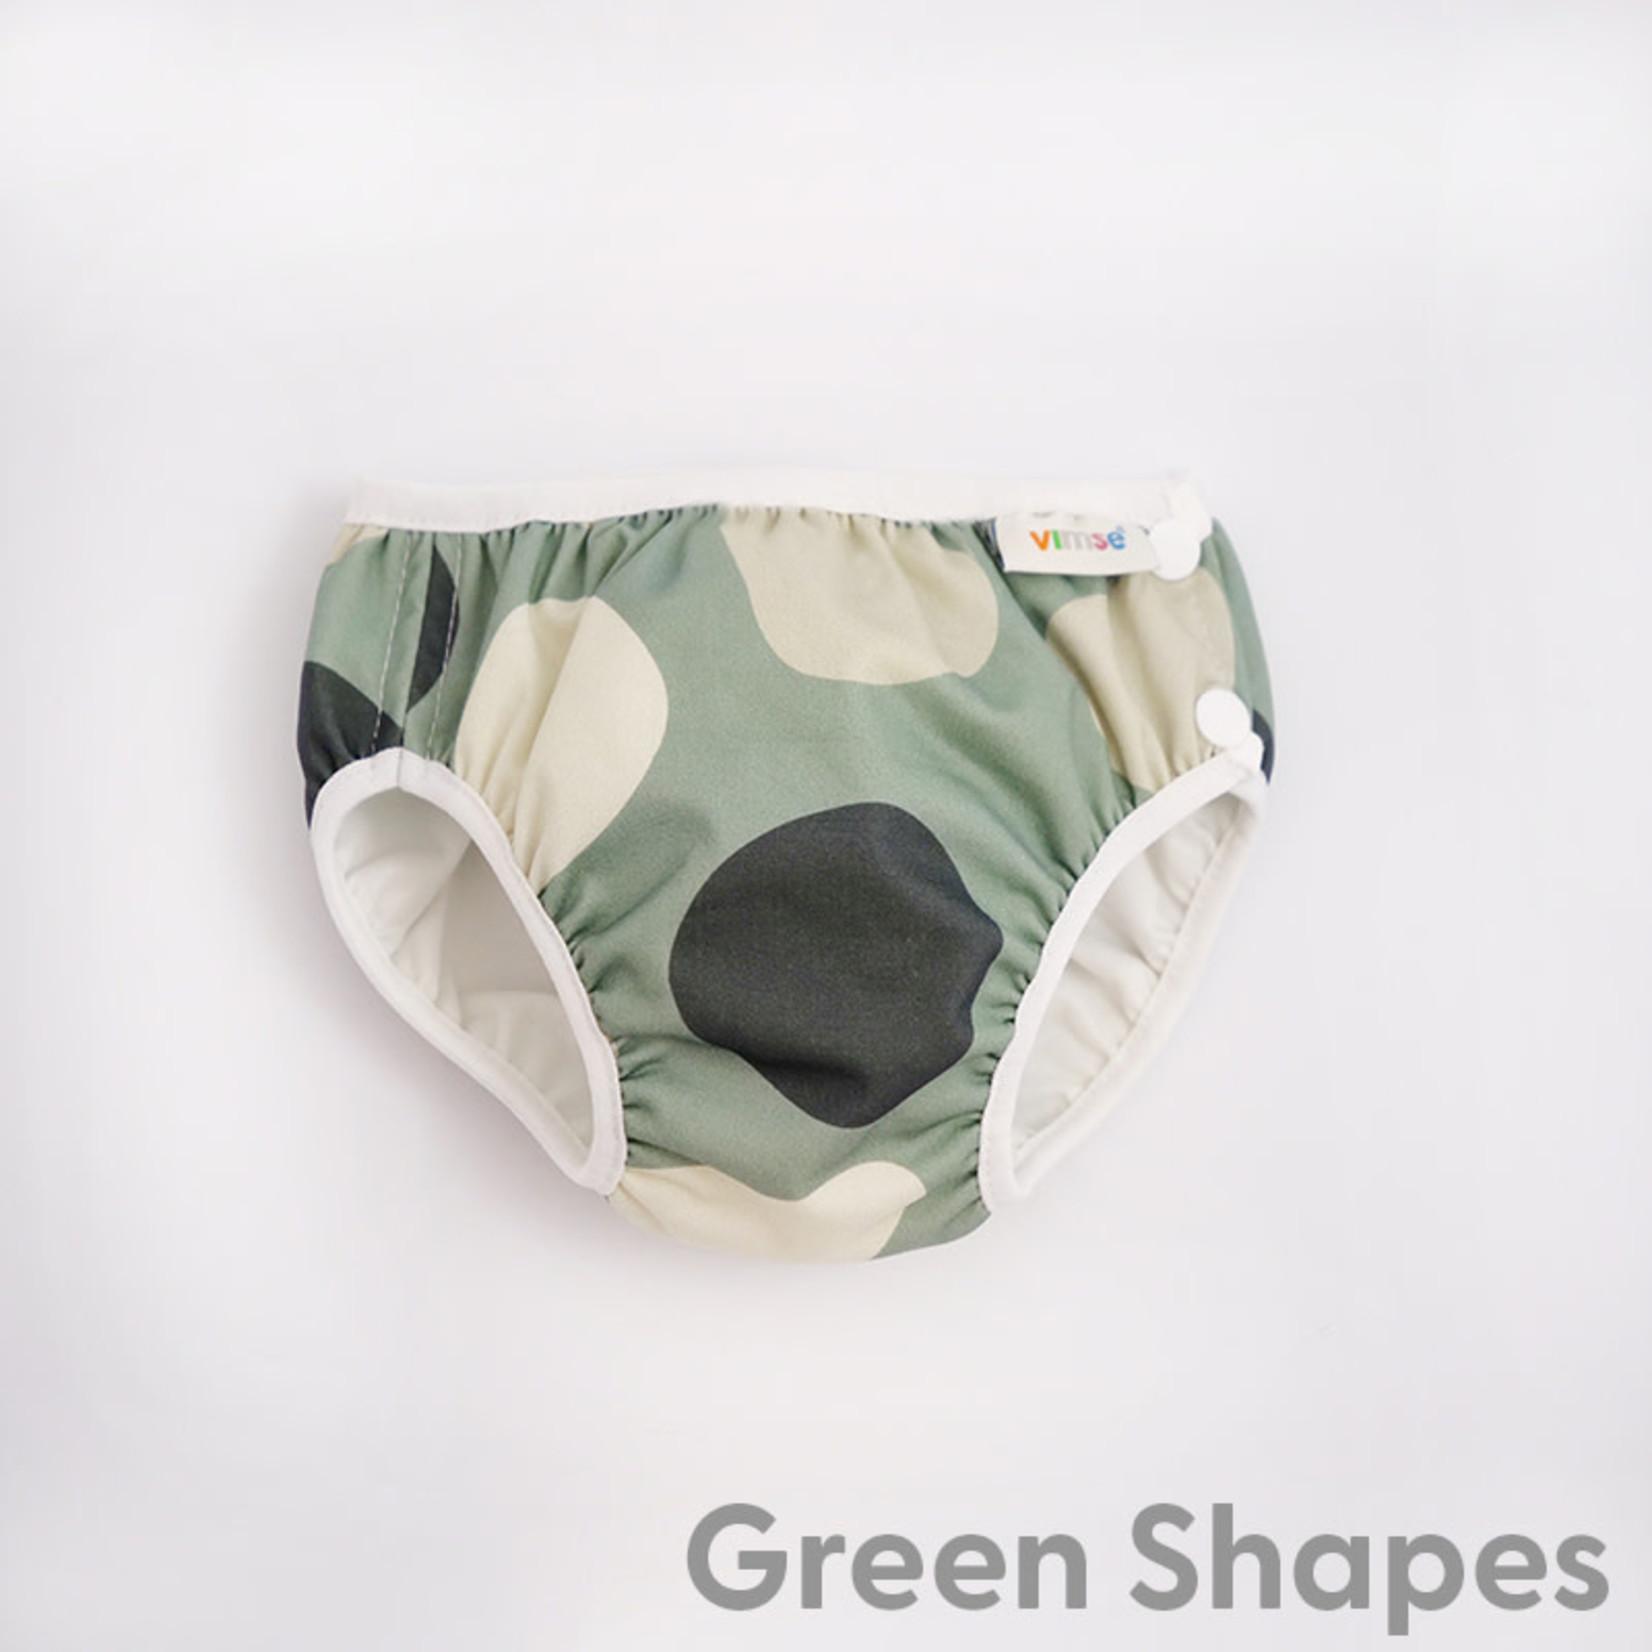 Imse Vimse Zwemluier (Green shapes)